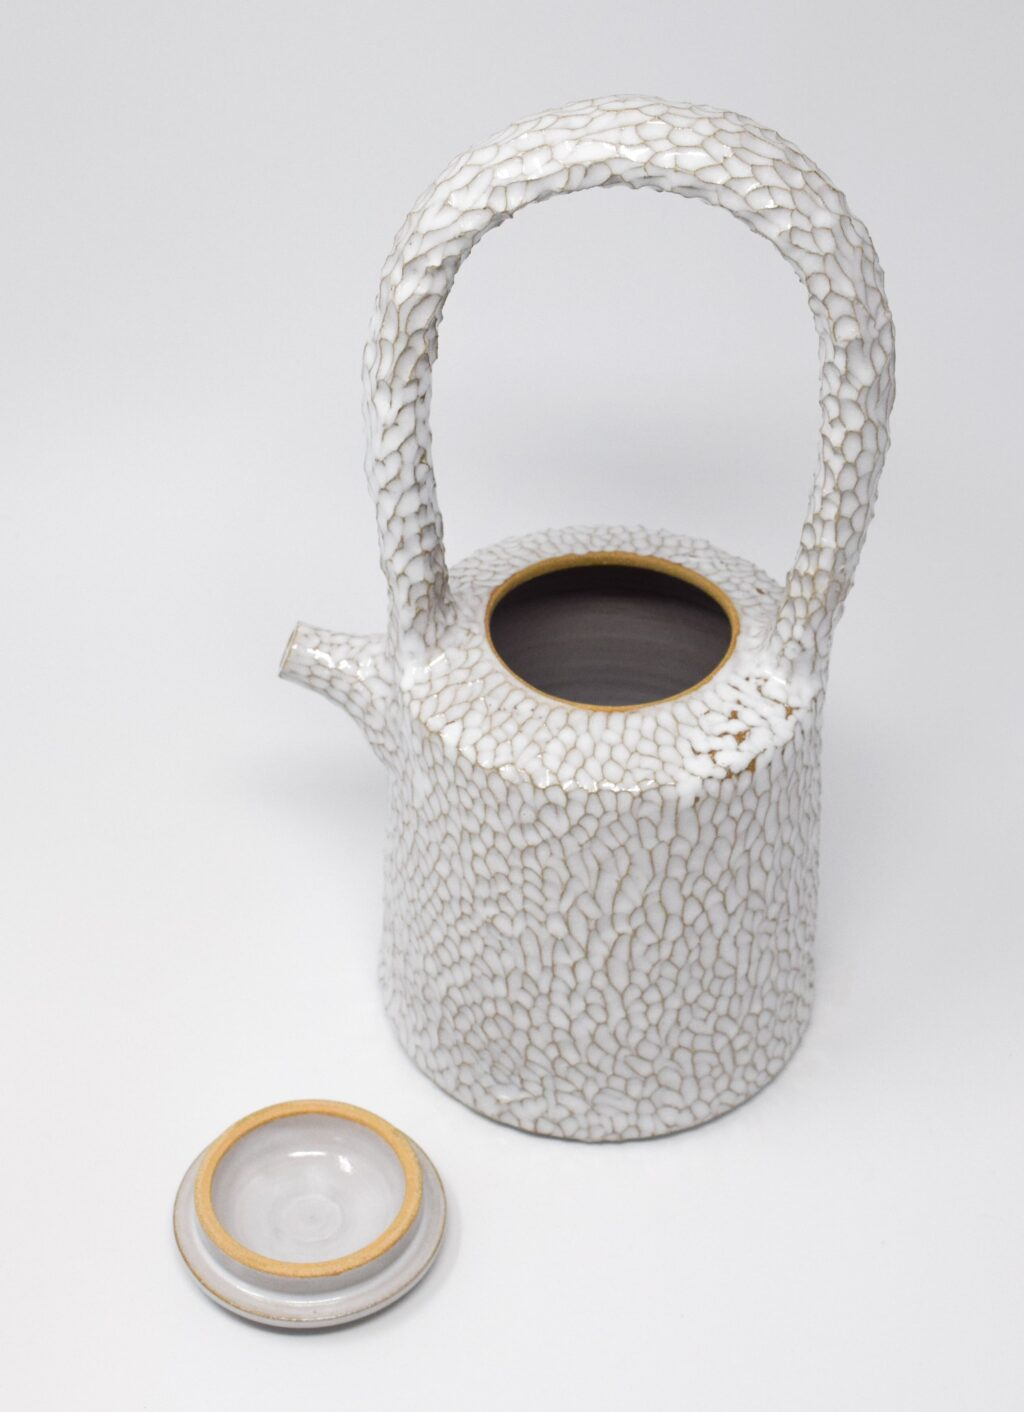 Aurore Vienna - Carved Ceramic - High Teapot with Ceramic Handle